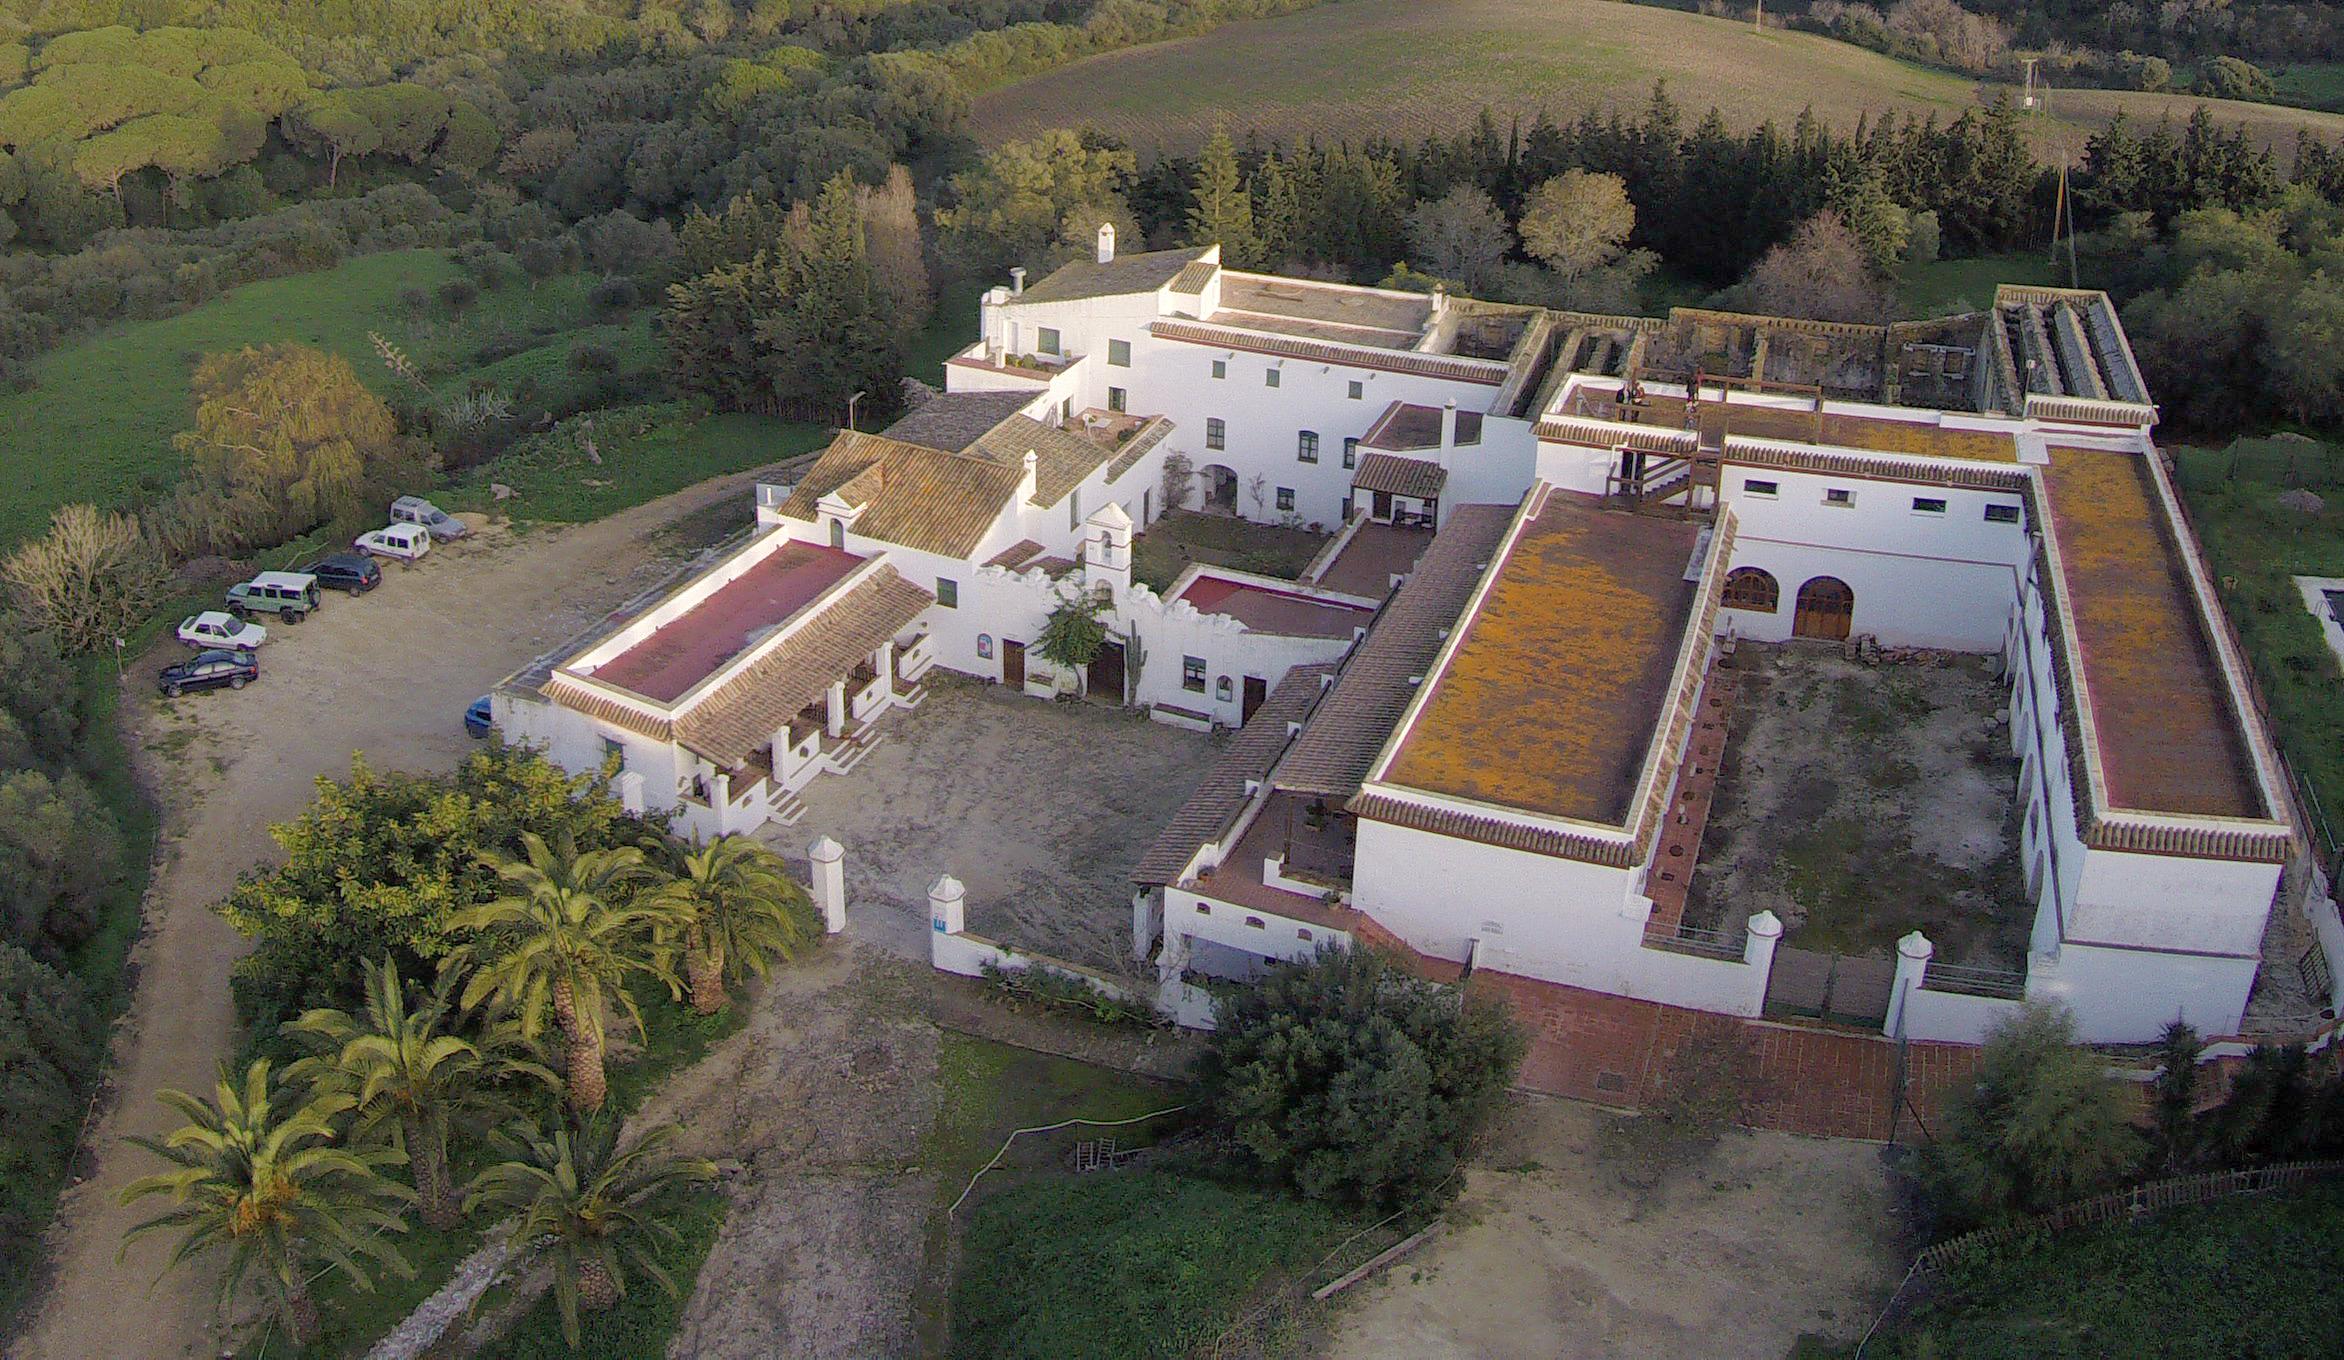 CHARMING RURAL HOTEL IN LA BREÑA-BARBATE